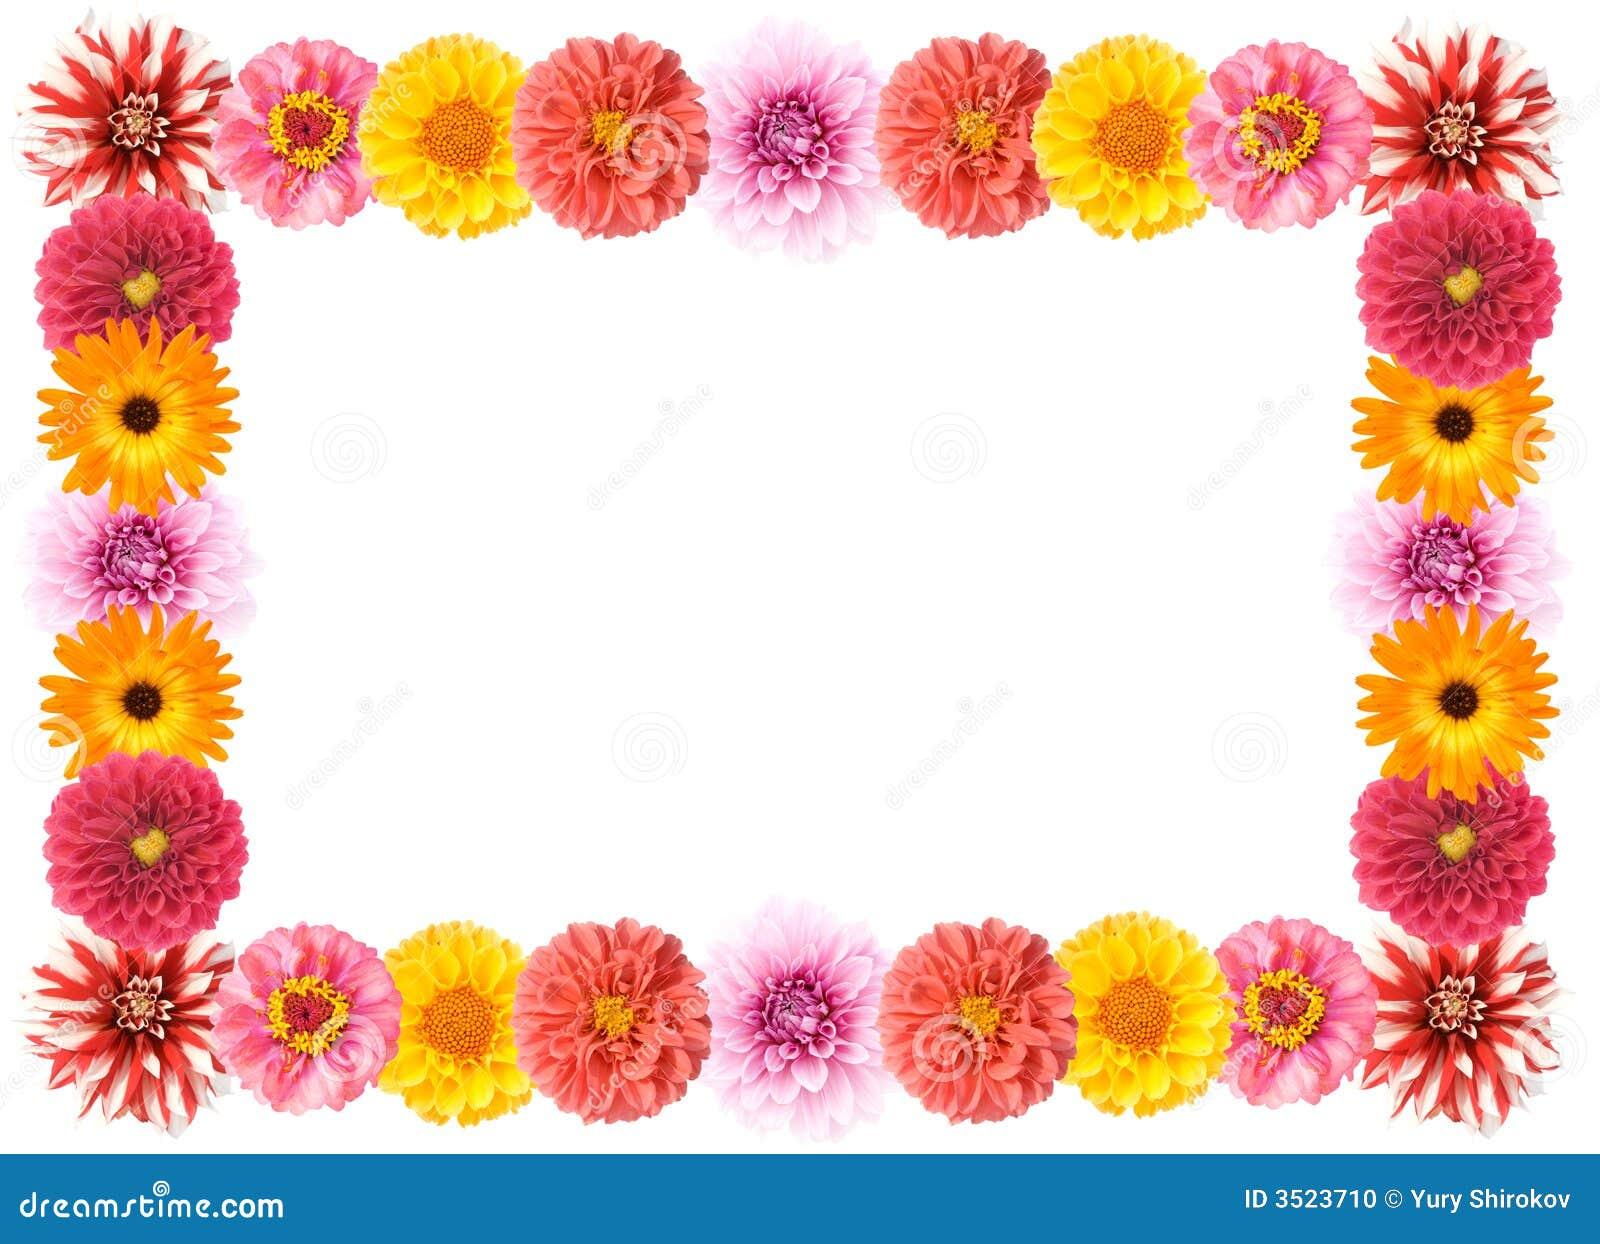 Flower Frame Stock Photo - Image: 3523710